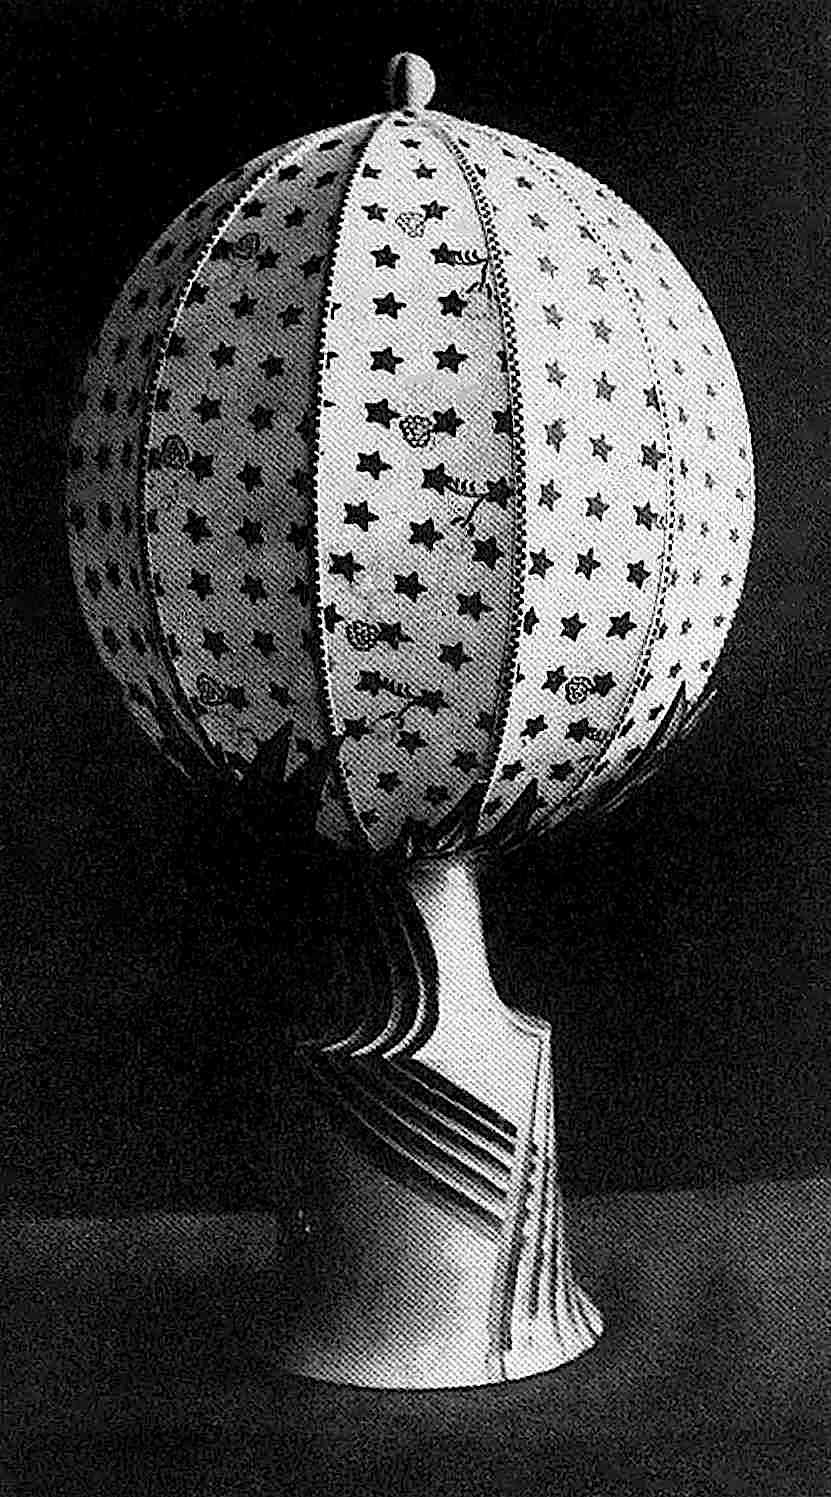 a 1920 table lamp by designer Dagobert Peche, sphere with stars